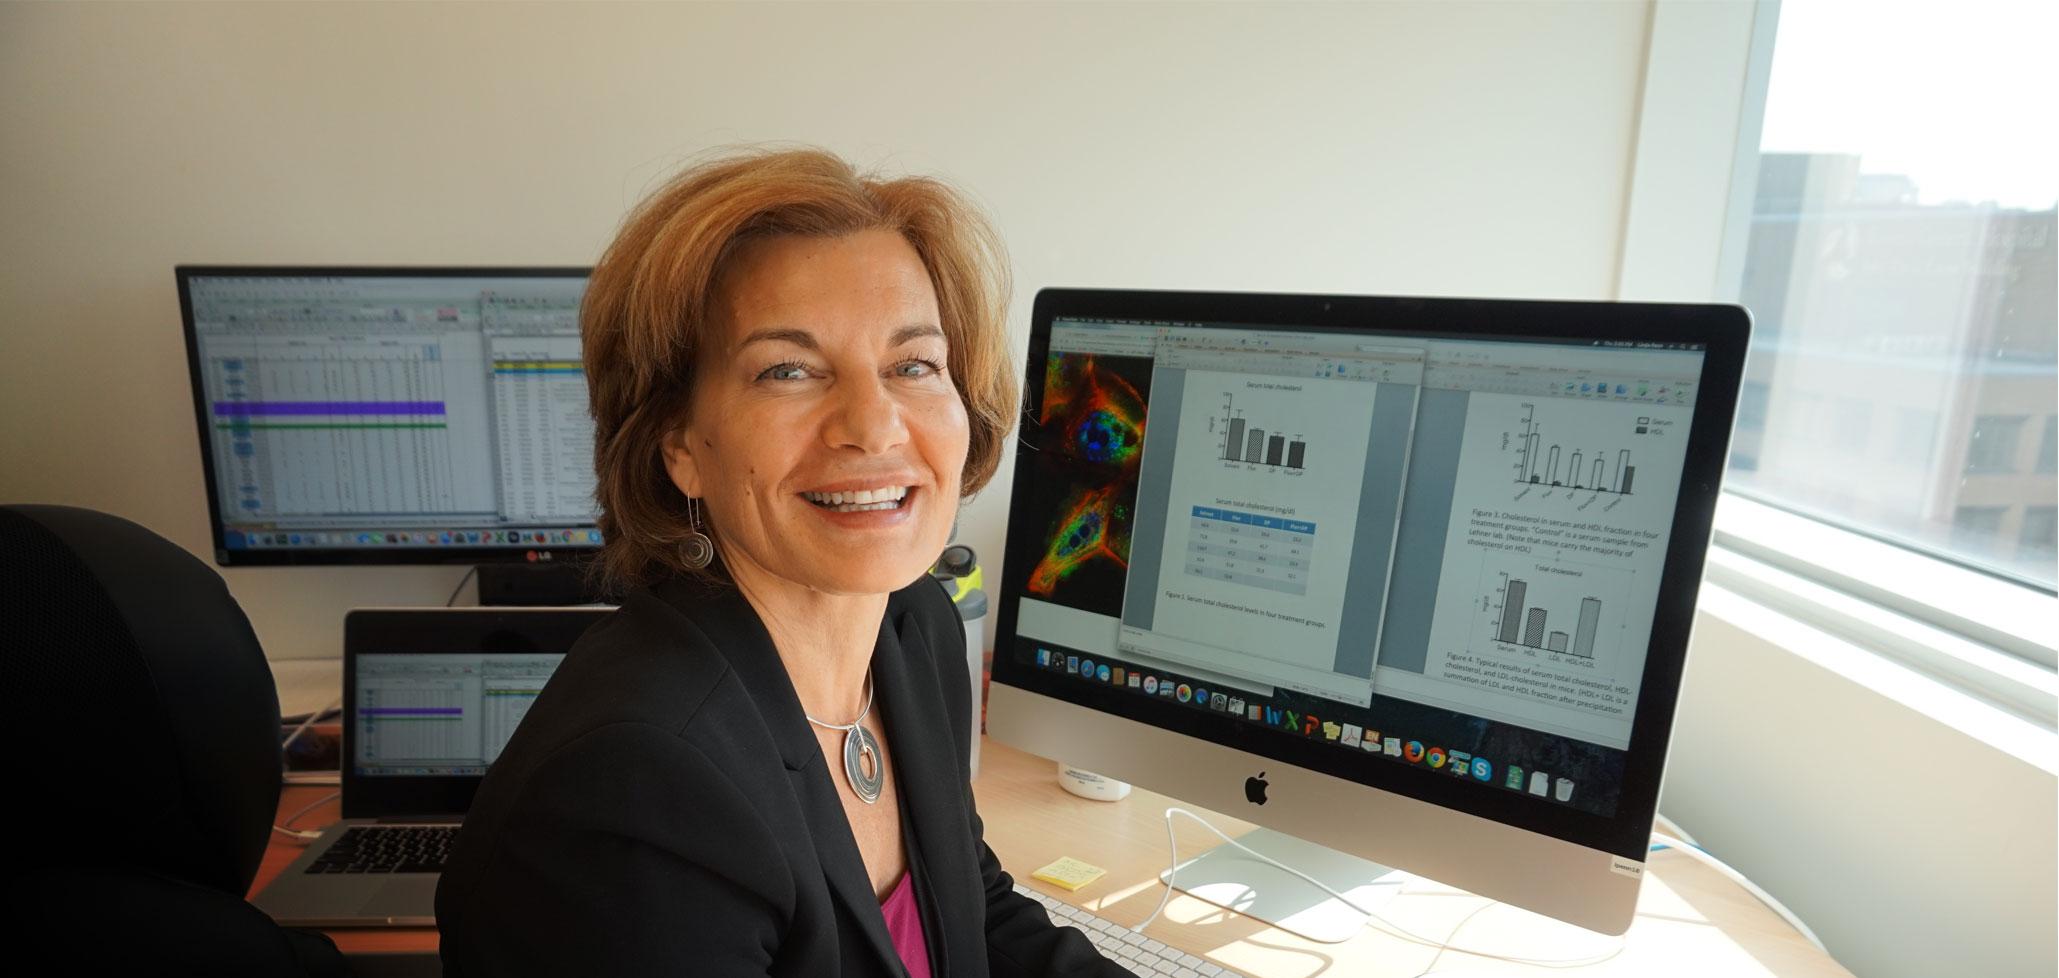 Linda Penn - Penn Lab